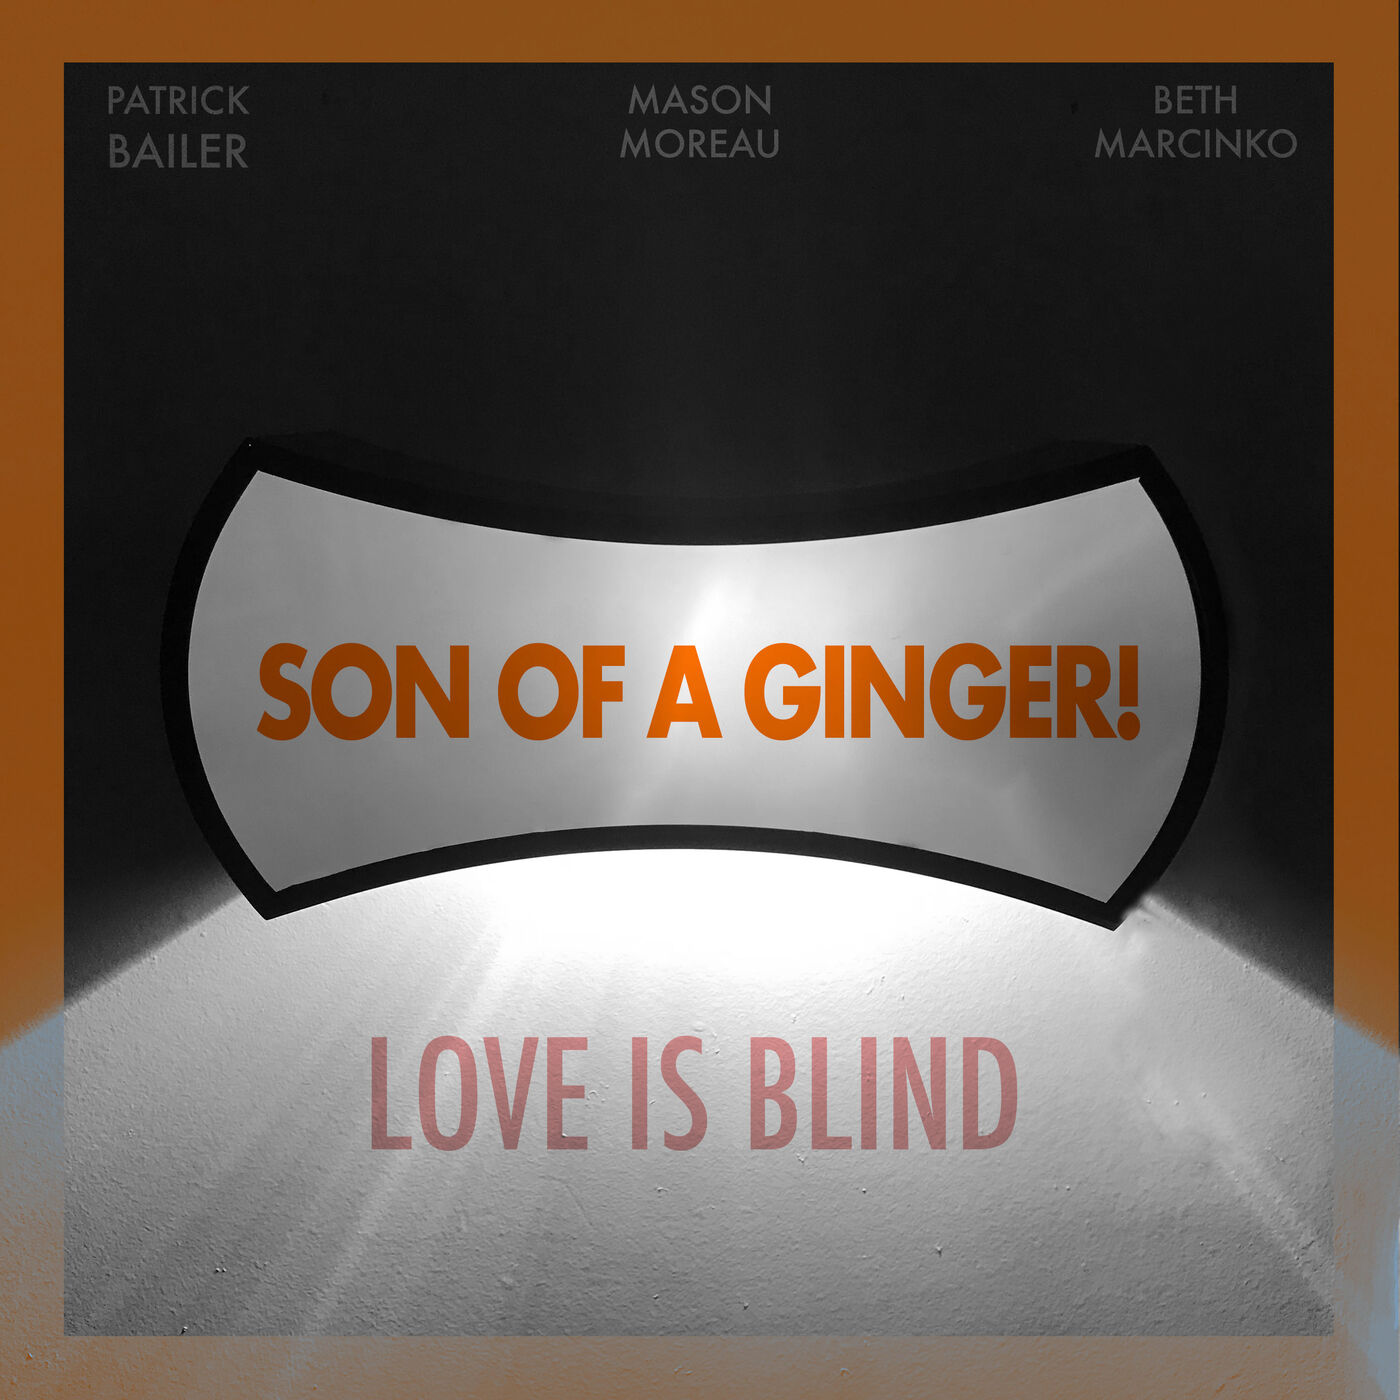 Love is Blind (Dir. by a Committee of People)